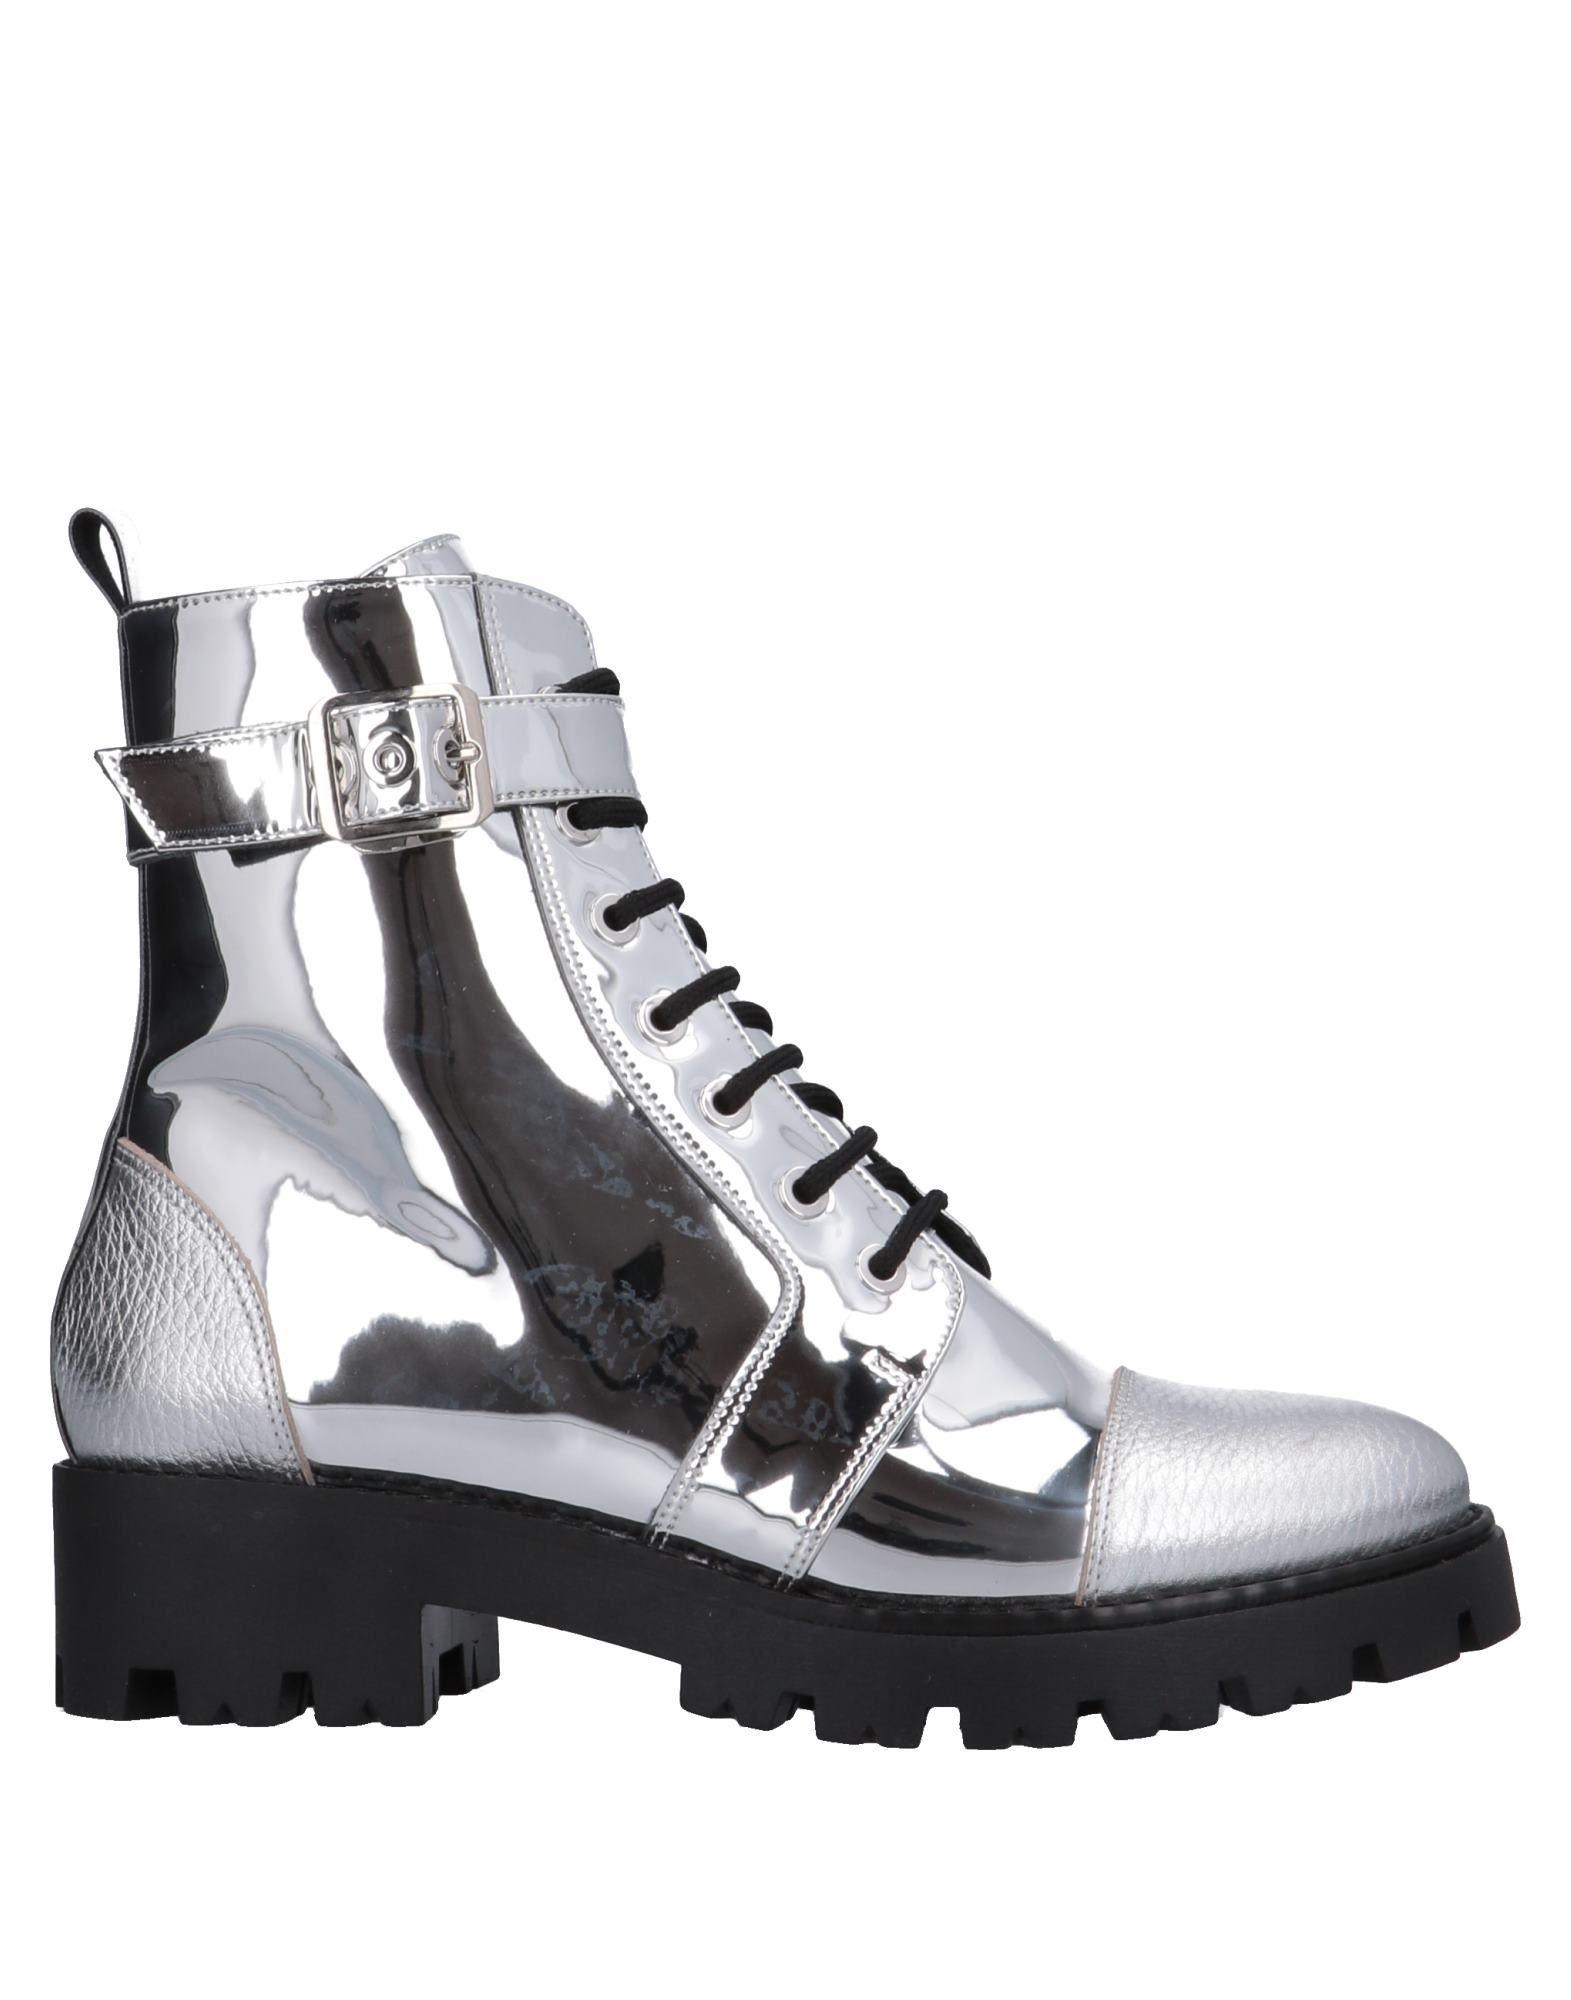 Atos Lombardini Stiefelette Damen  11526856TFGut aussehende strapazierfähige Schuhe